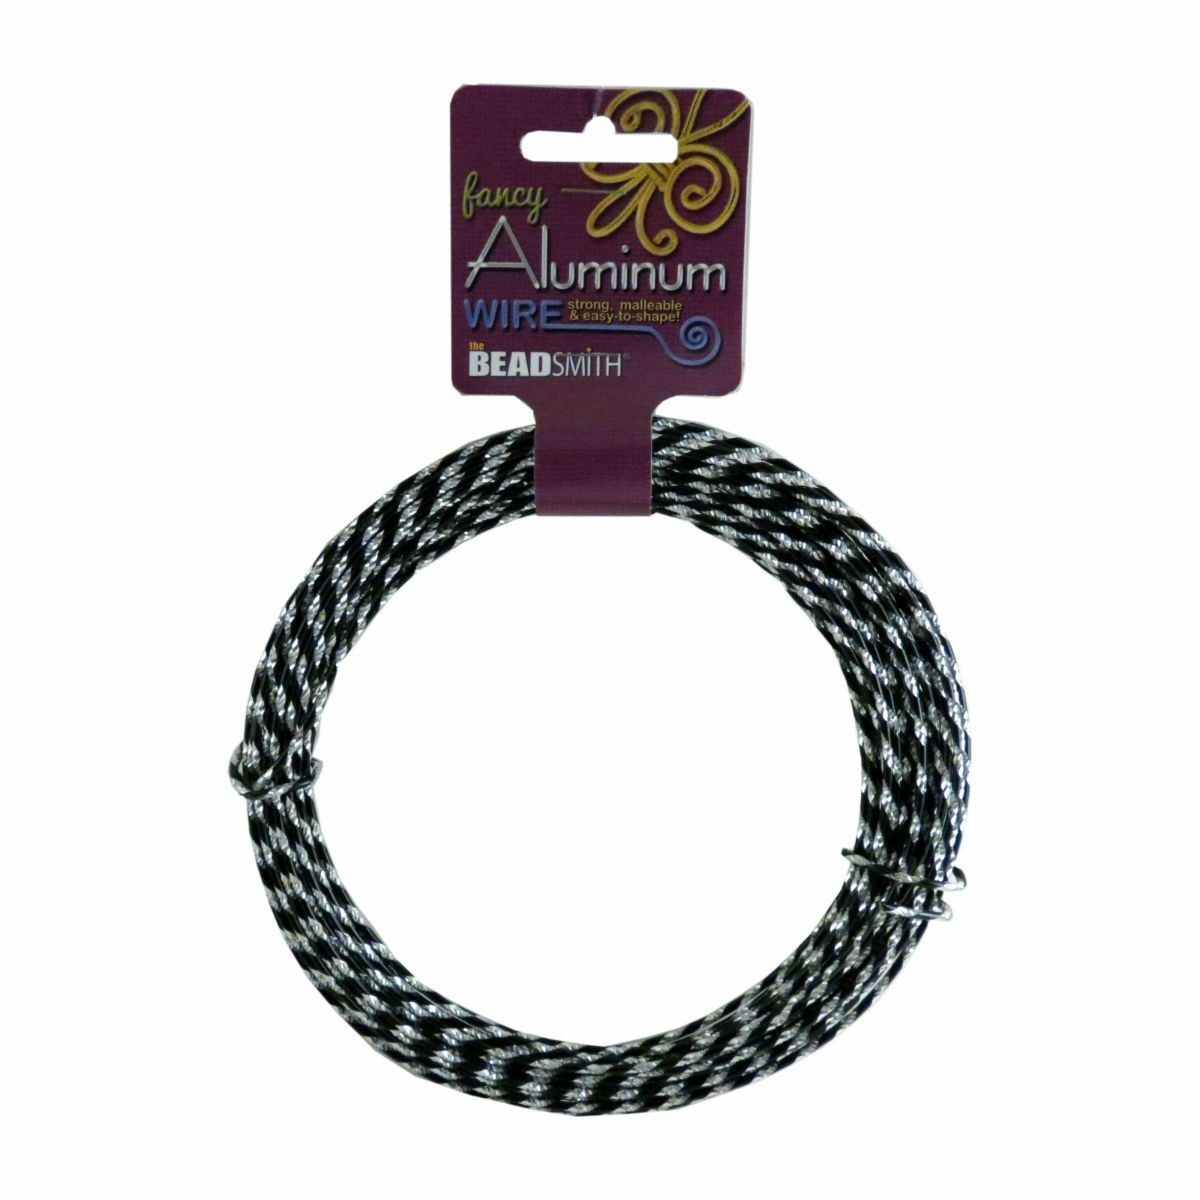 Beadsmith 12m Diamond Cut Aluminum Jewelry Craft Wire 12 Gauge ...